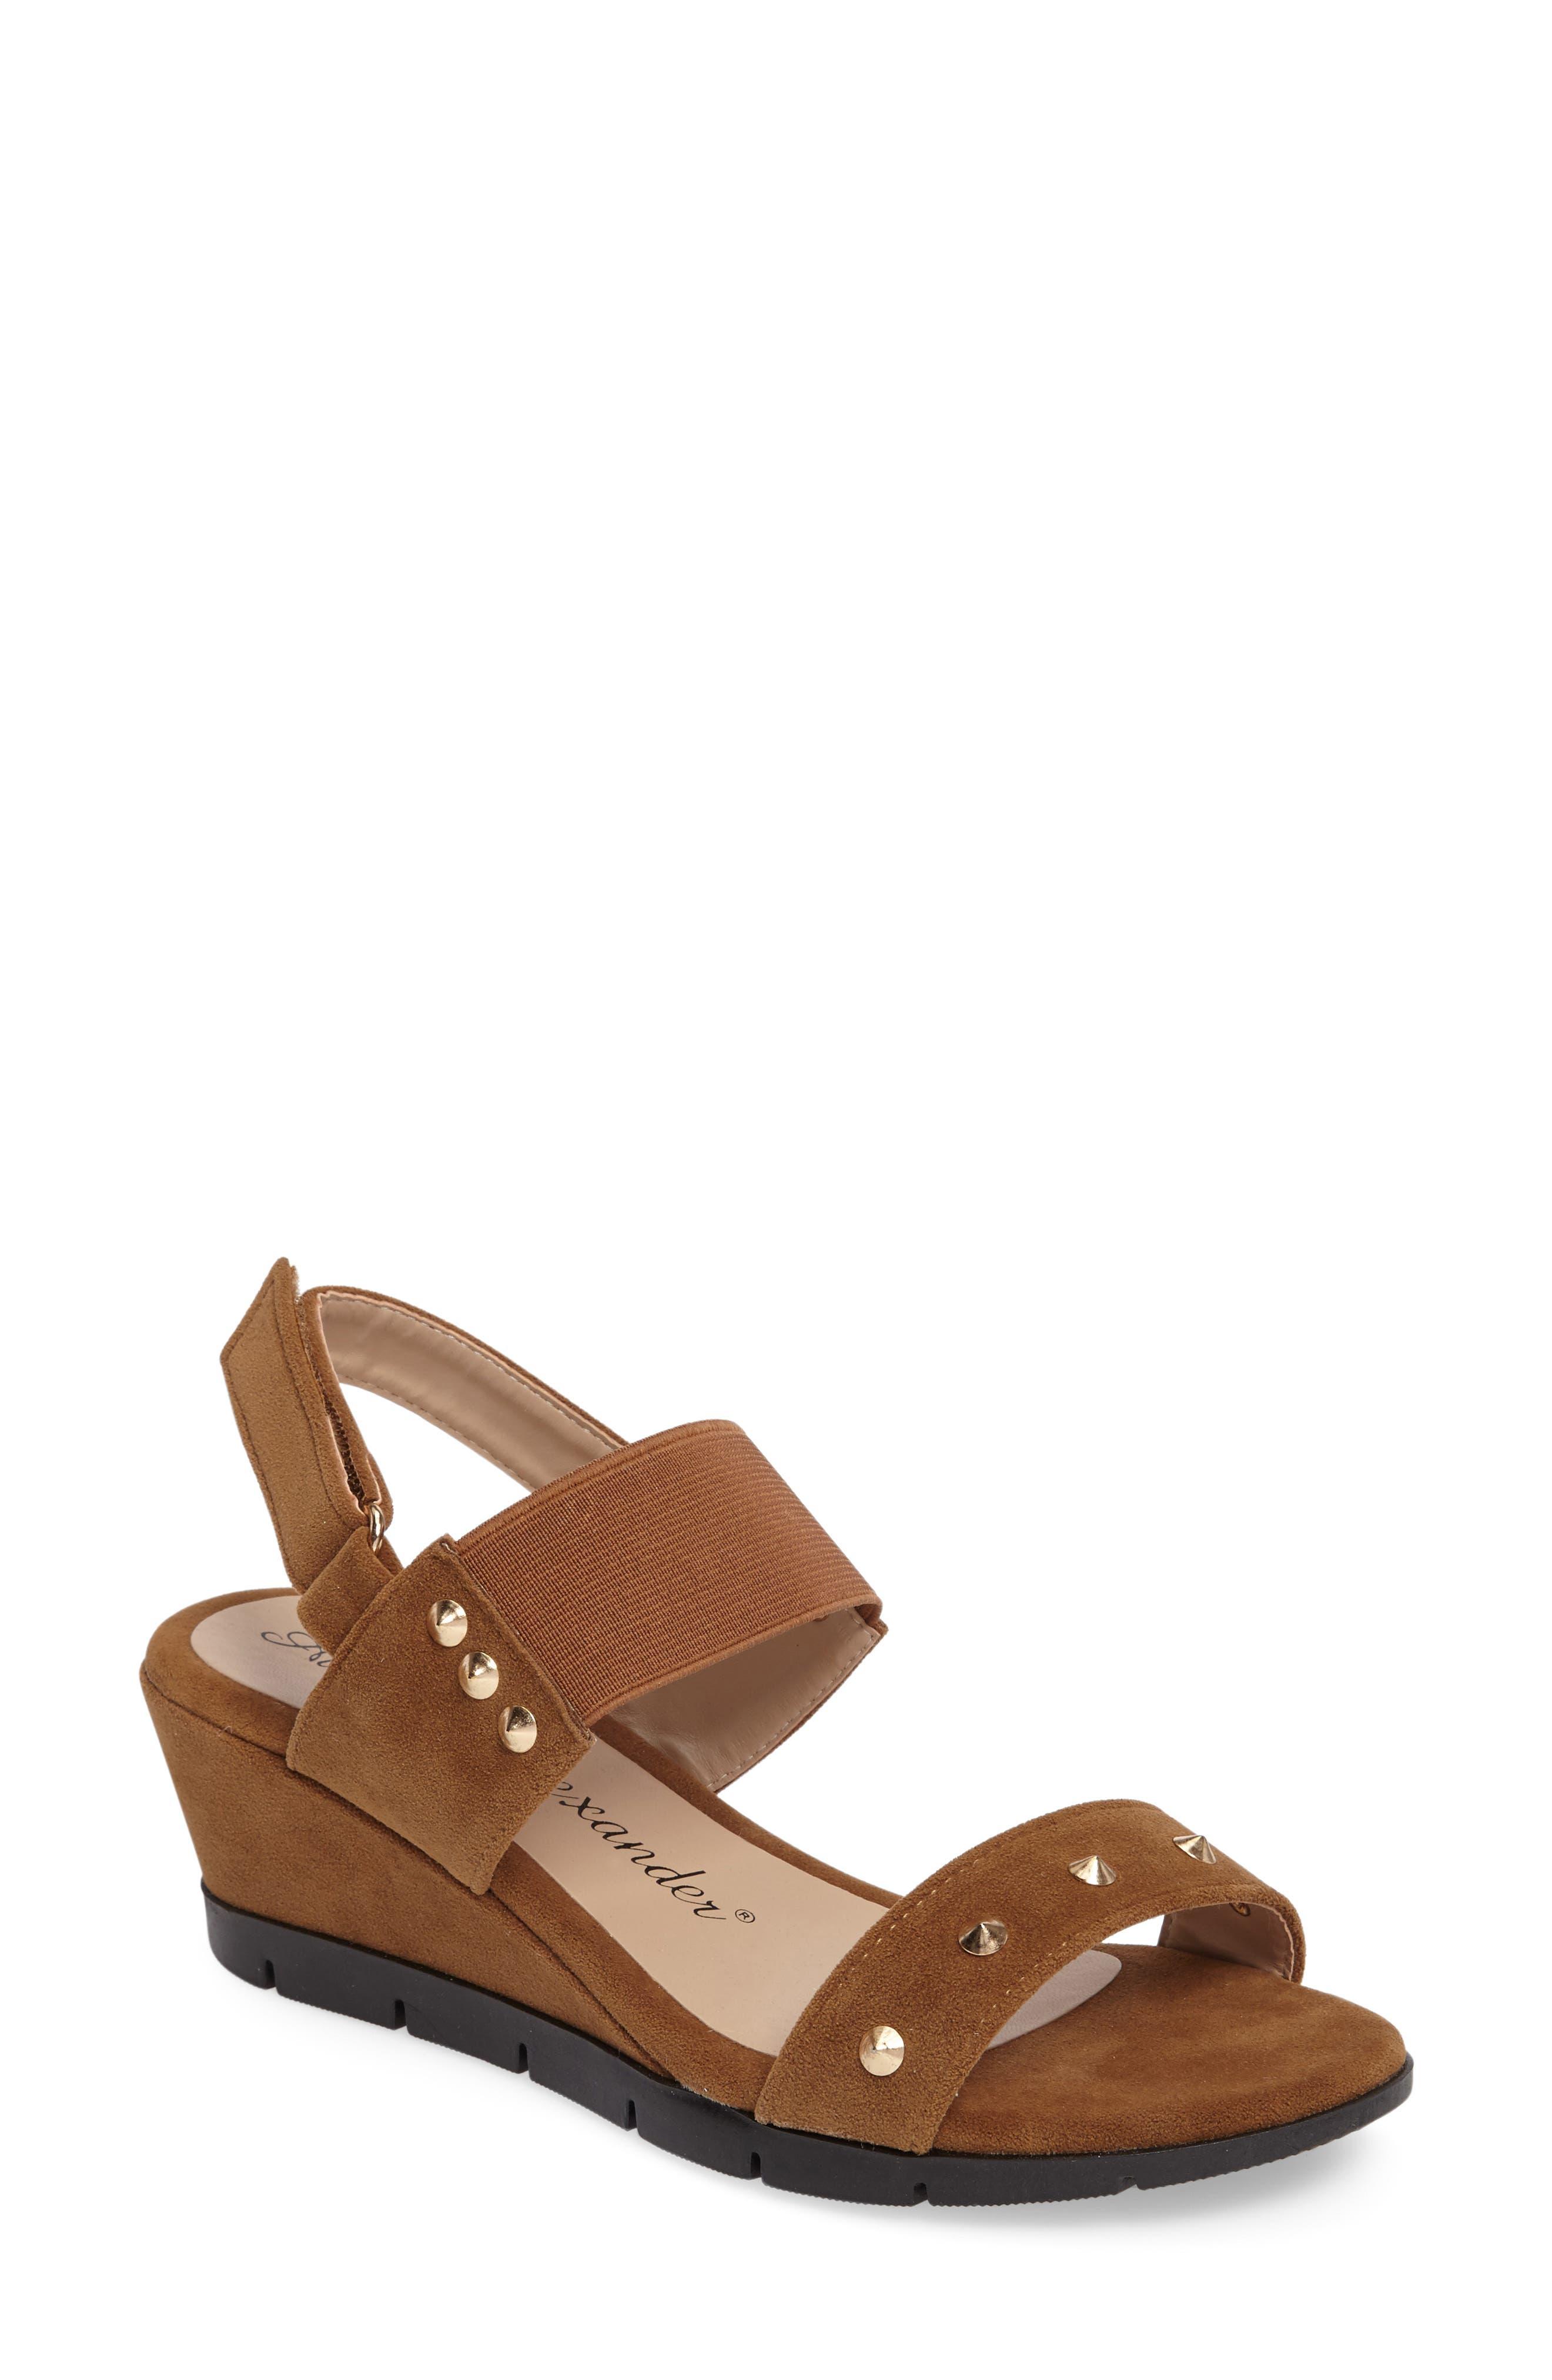 Athena Alexander Pennye Studded Wedge Sandal (Women)